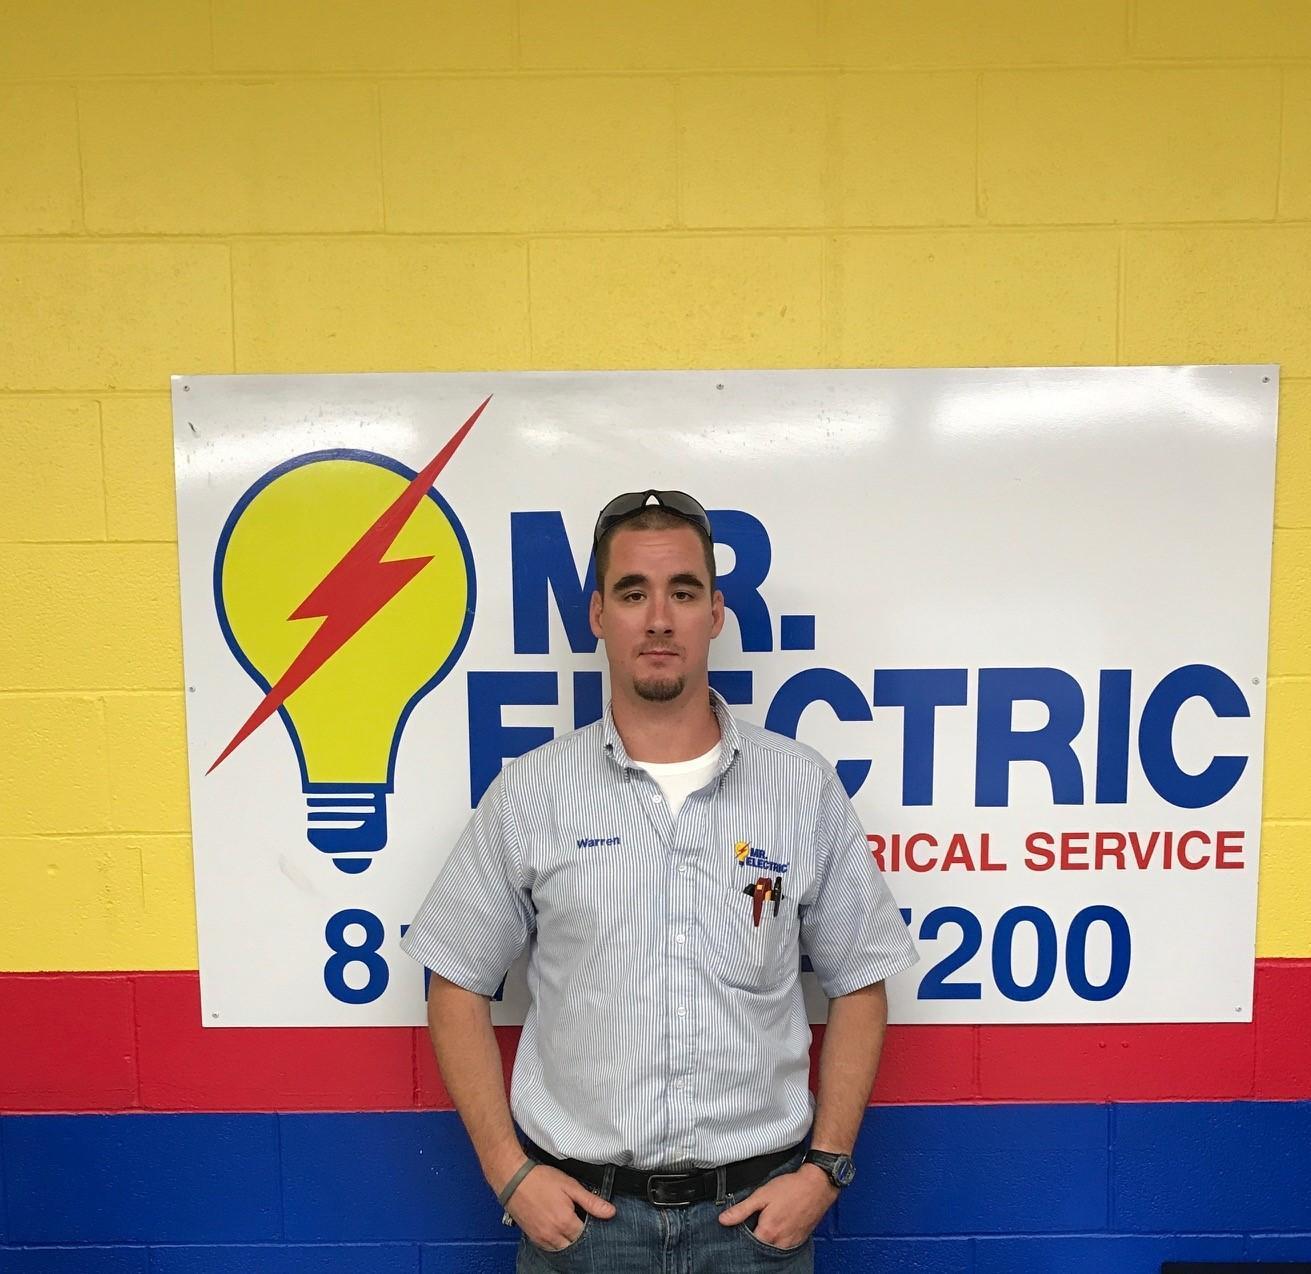 Mr. Electric image 10